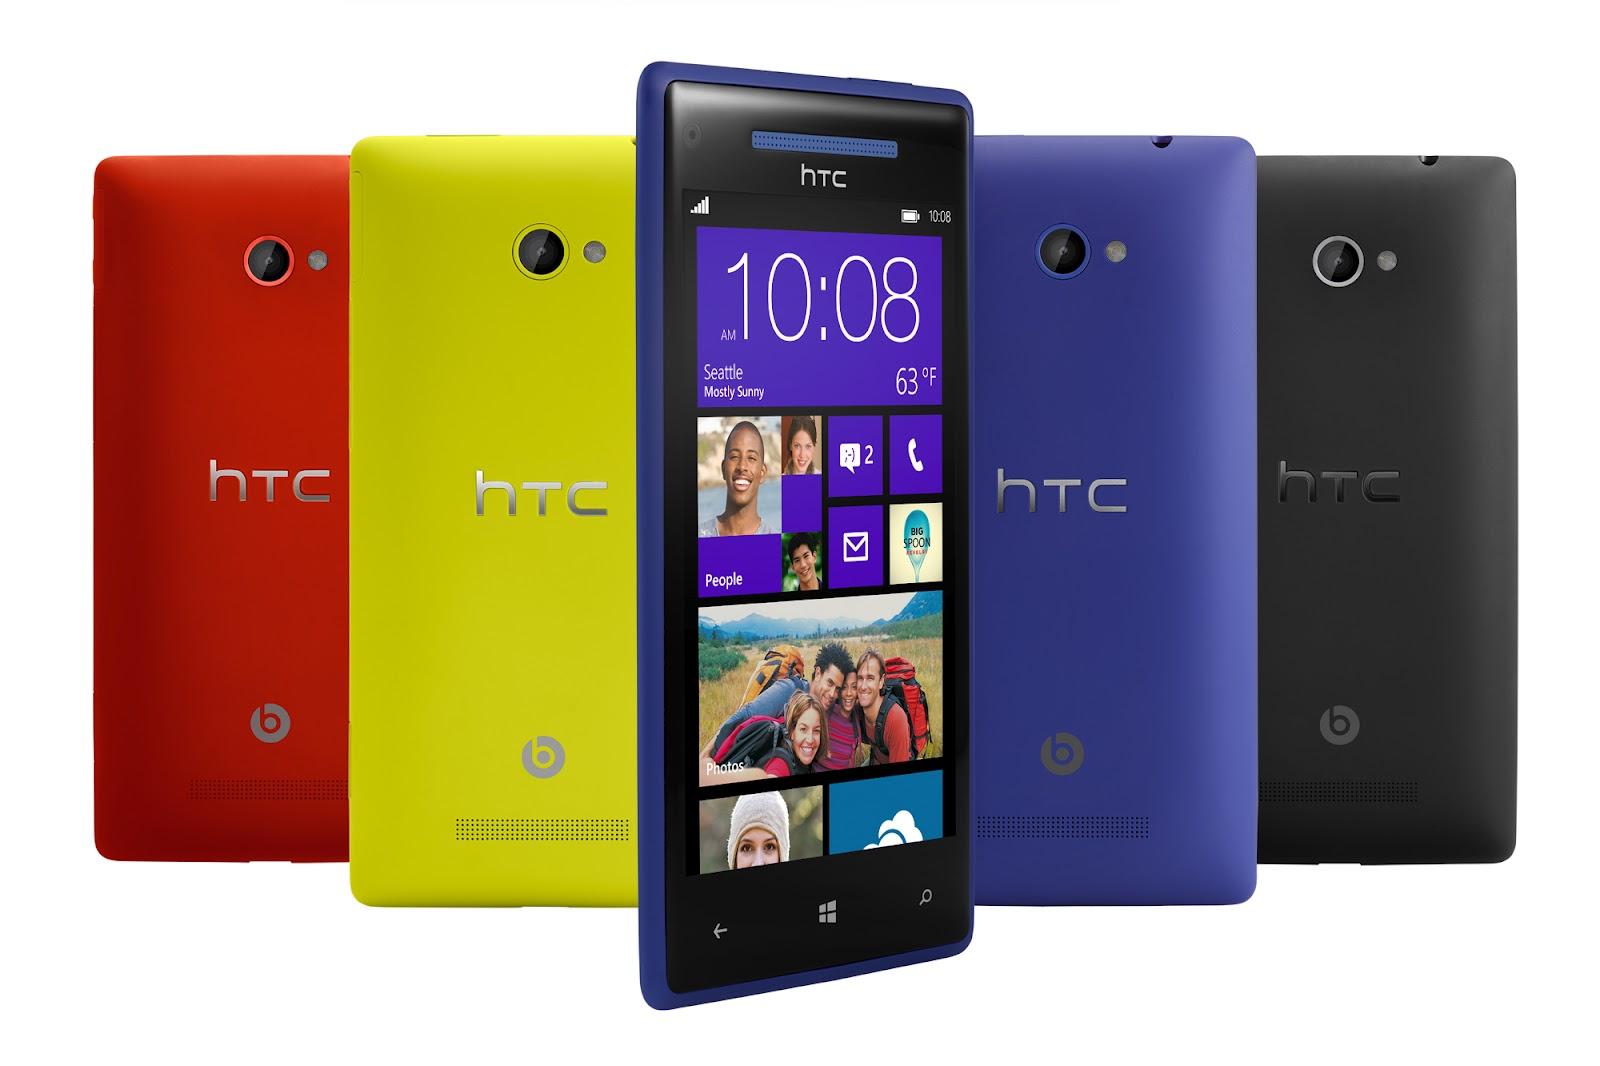 Представлены смартфоны HTC 8X и 8S на Windows Phone 8